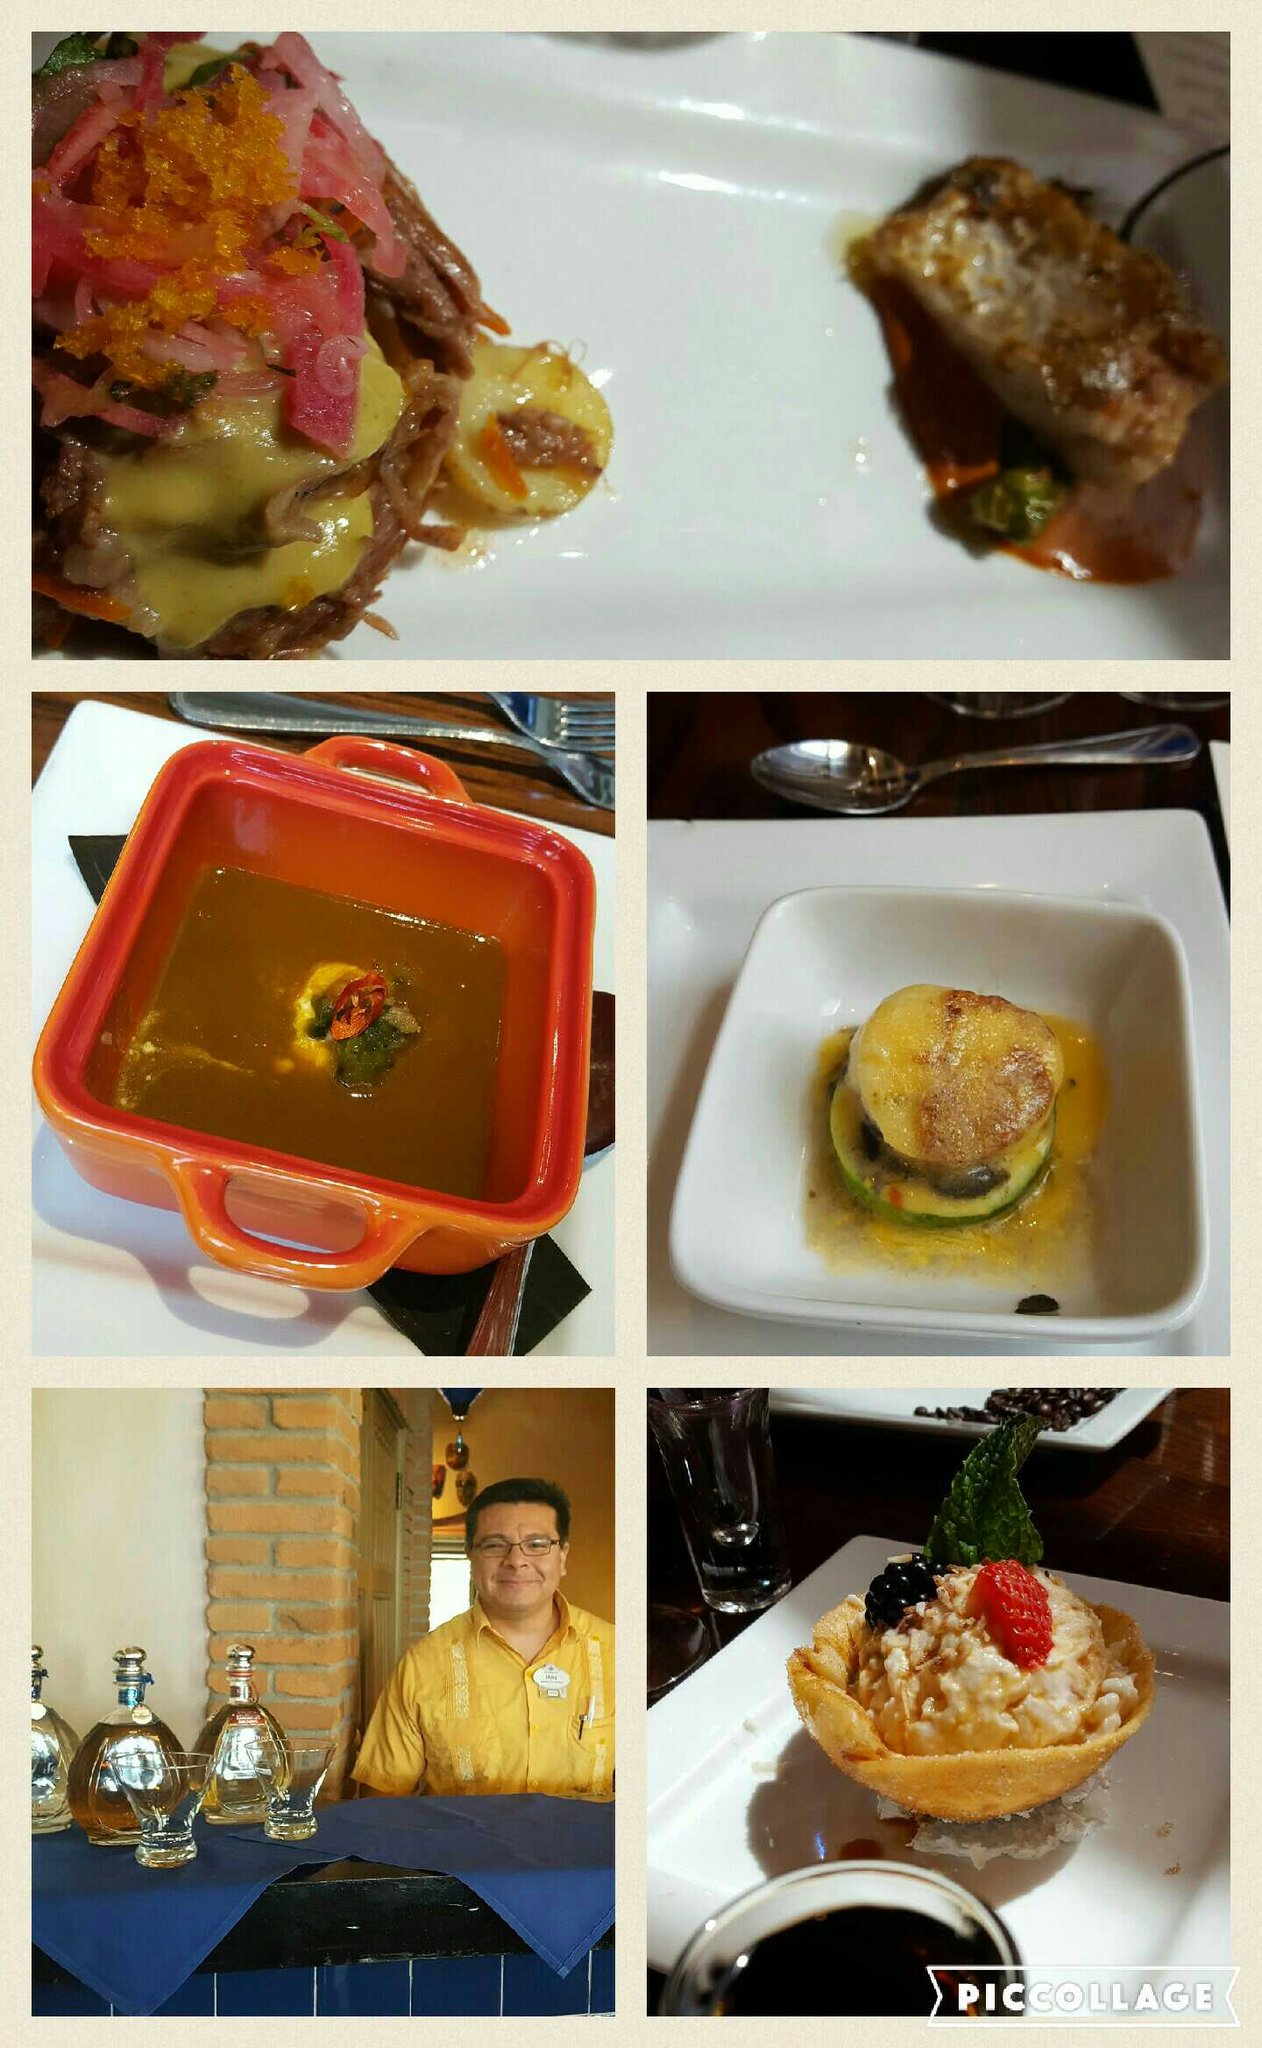 #TequilaLunch 2016 @lahaciendaepcot @chefzendejas @Tequilatotaste @cavadeltequila @madeintequila #foodie #epcot https://t.co/1ikbimBAfW